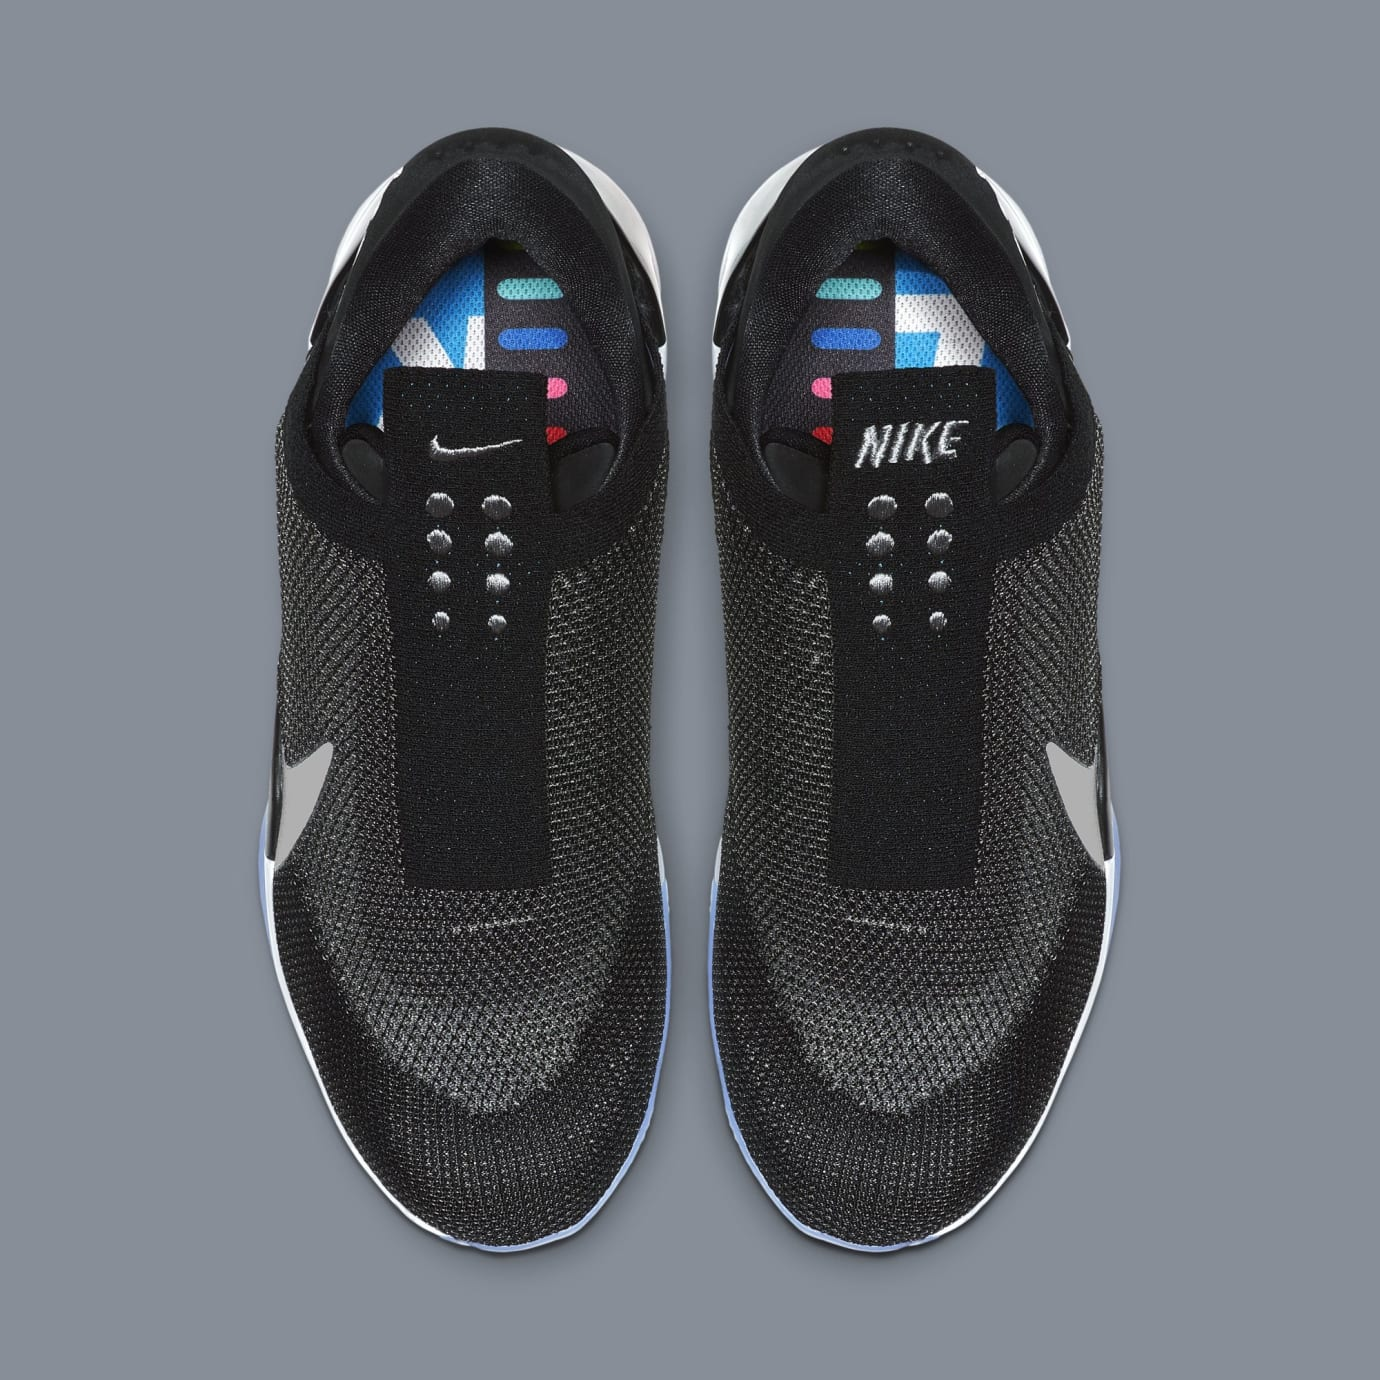 36e9b9744a25 Image via Nike Nike Adapt BB  Black White Pure Platinum  AO2582-001 (Top